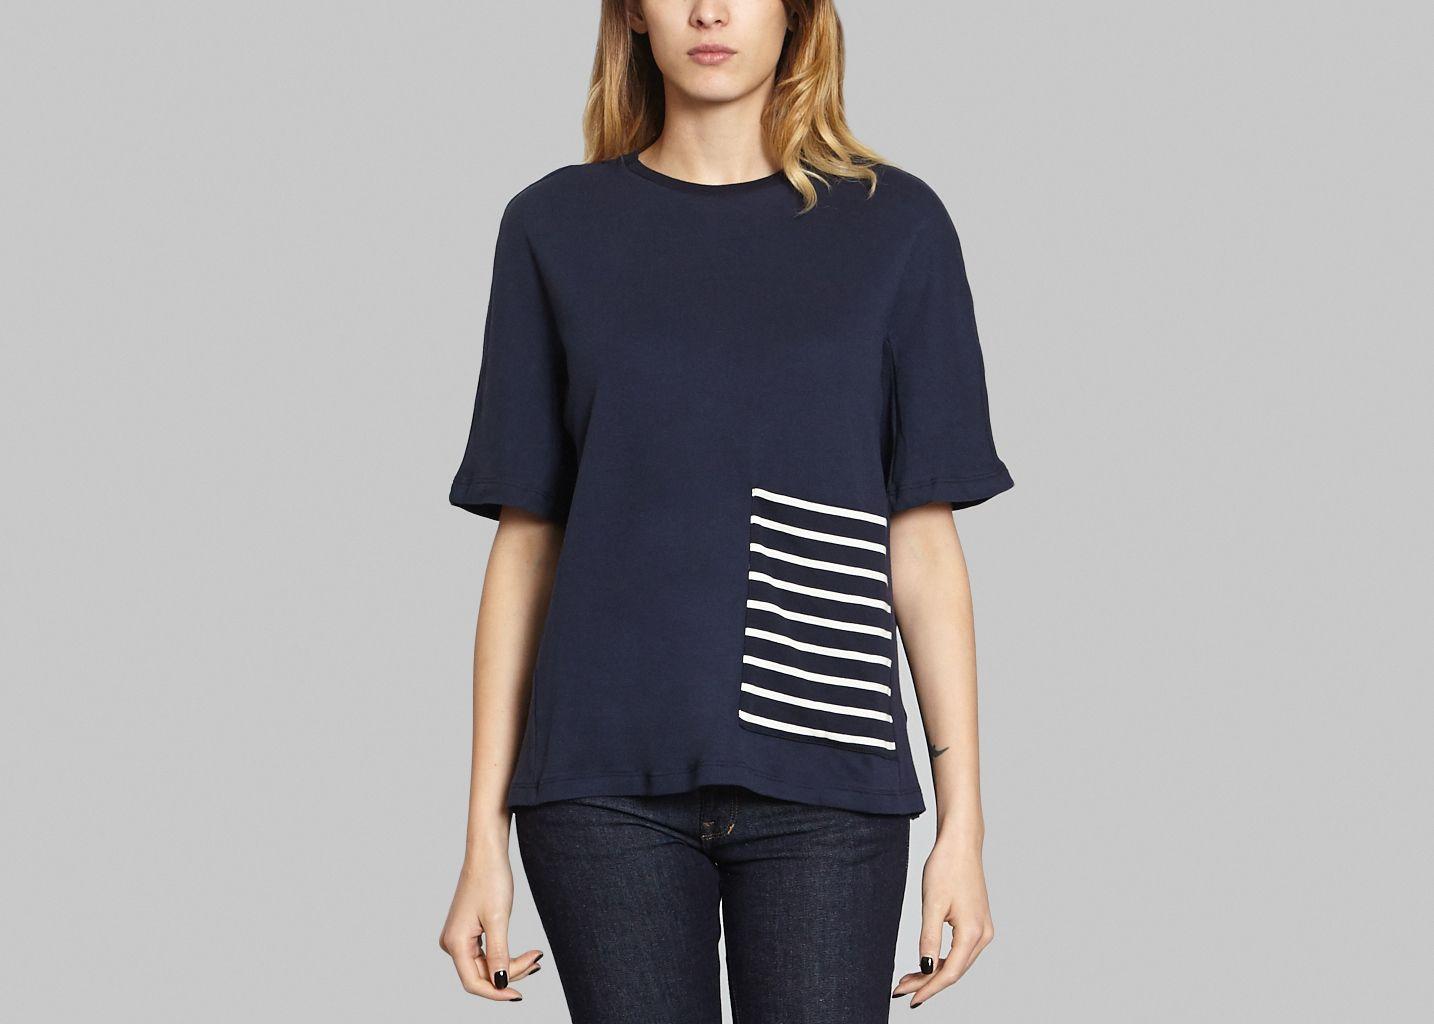 Tshirt Poche Large - Petit Bateau